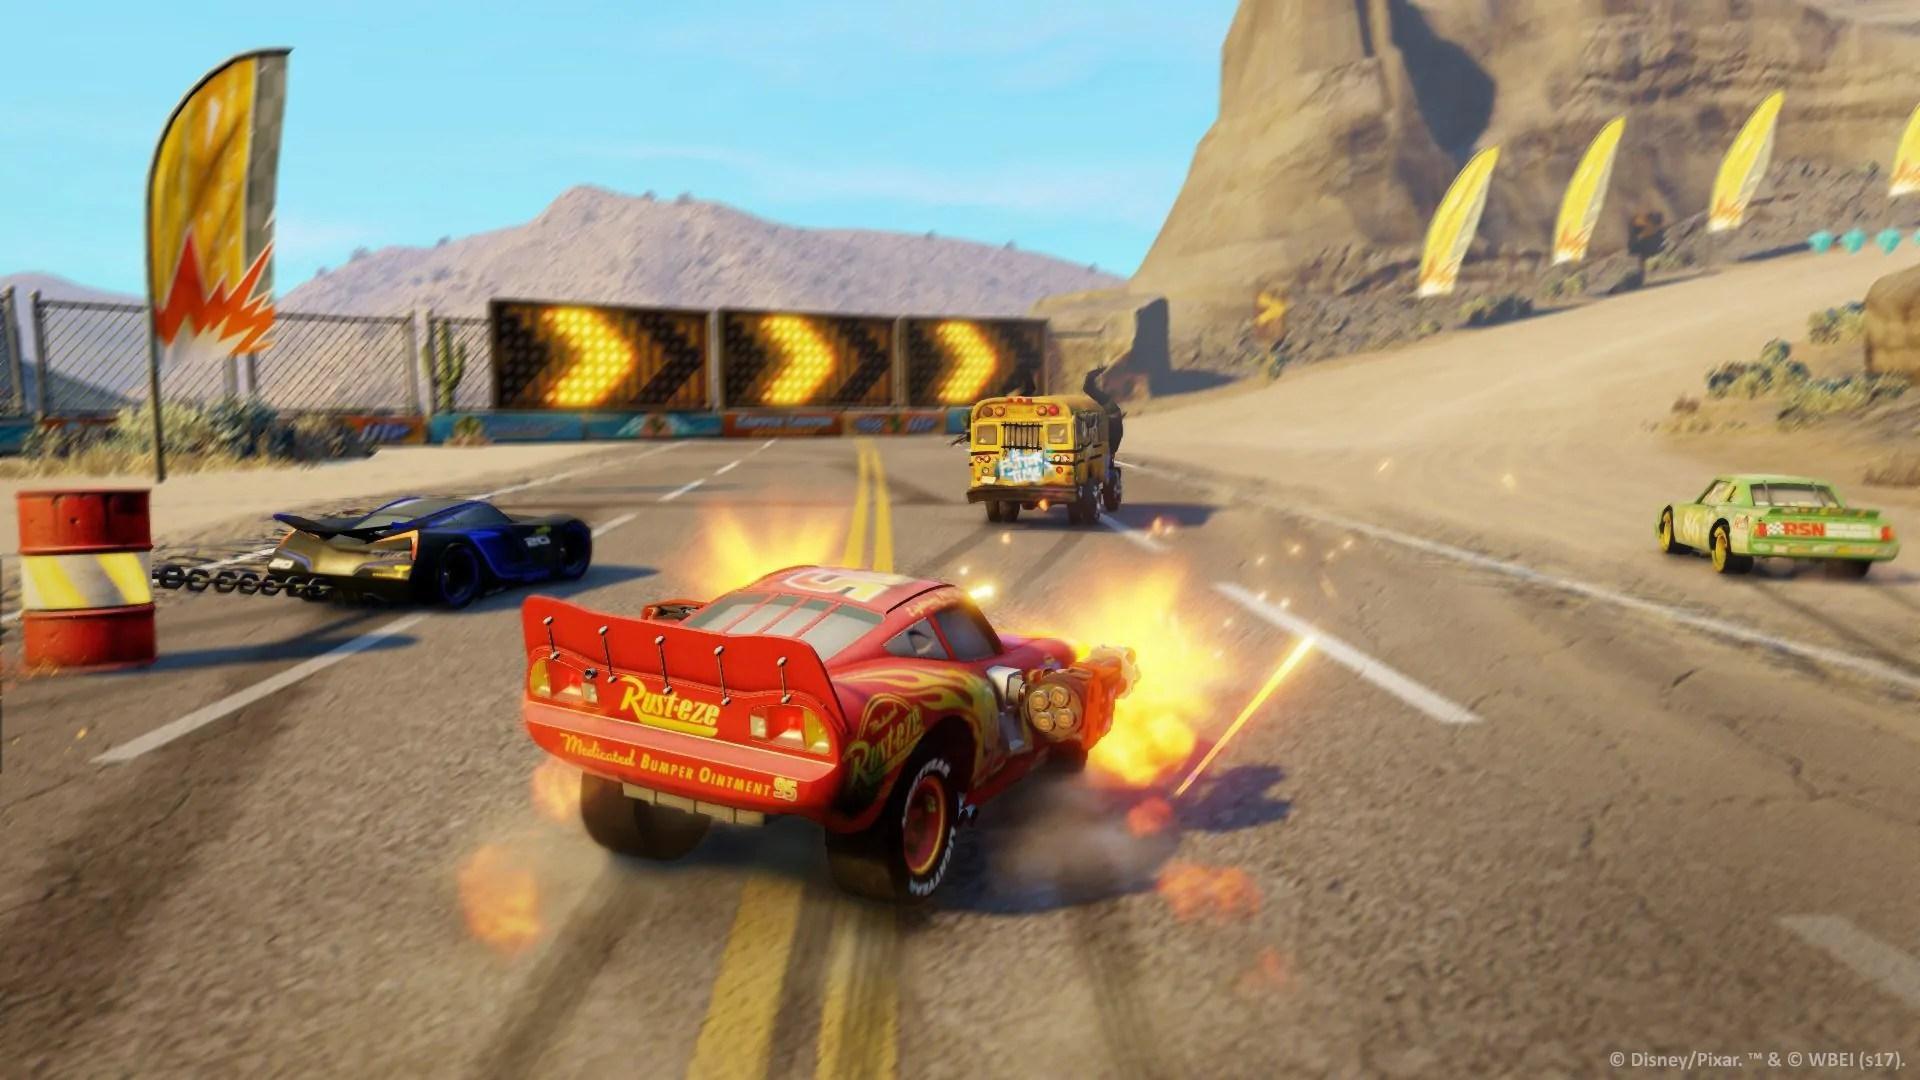 Cars 3: In gara per la vittoria, tutti in pista! 4